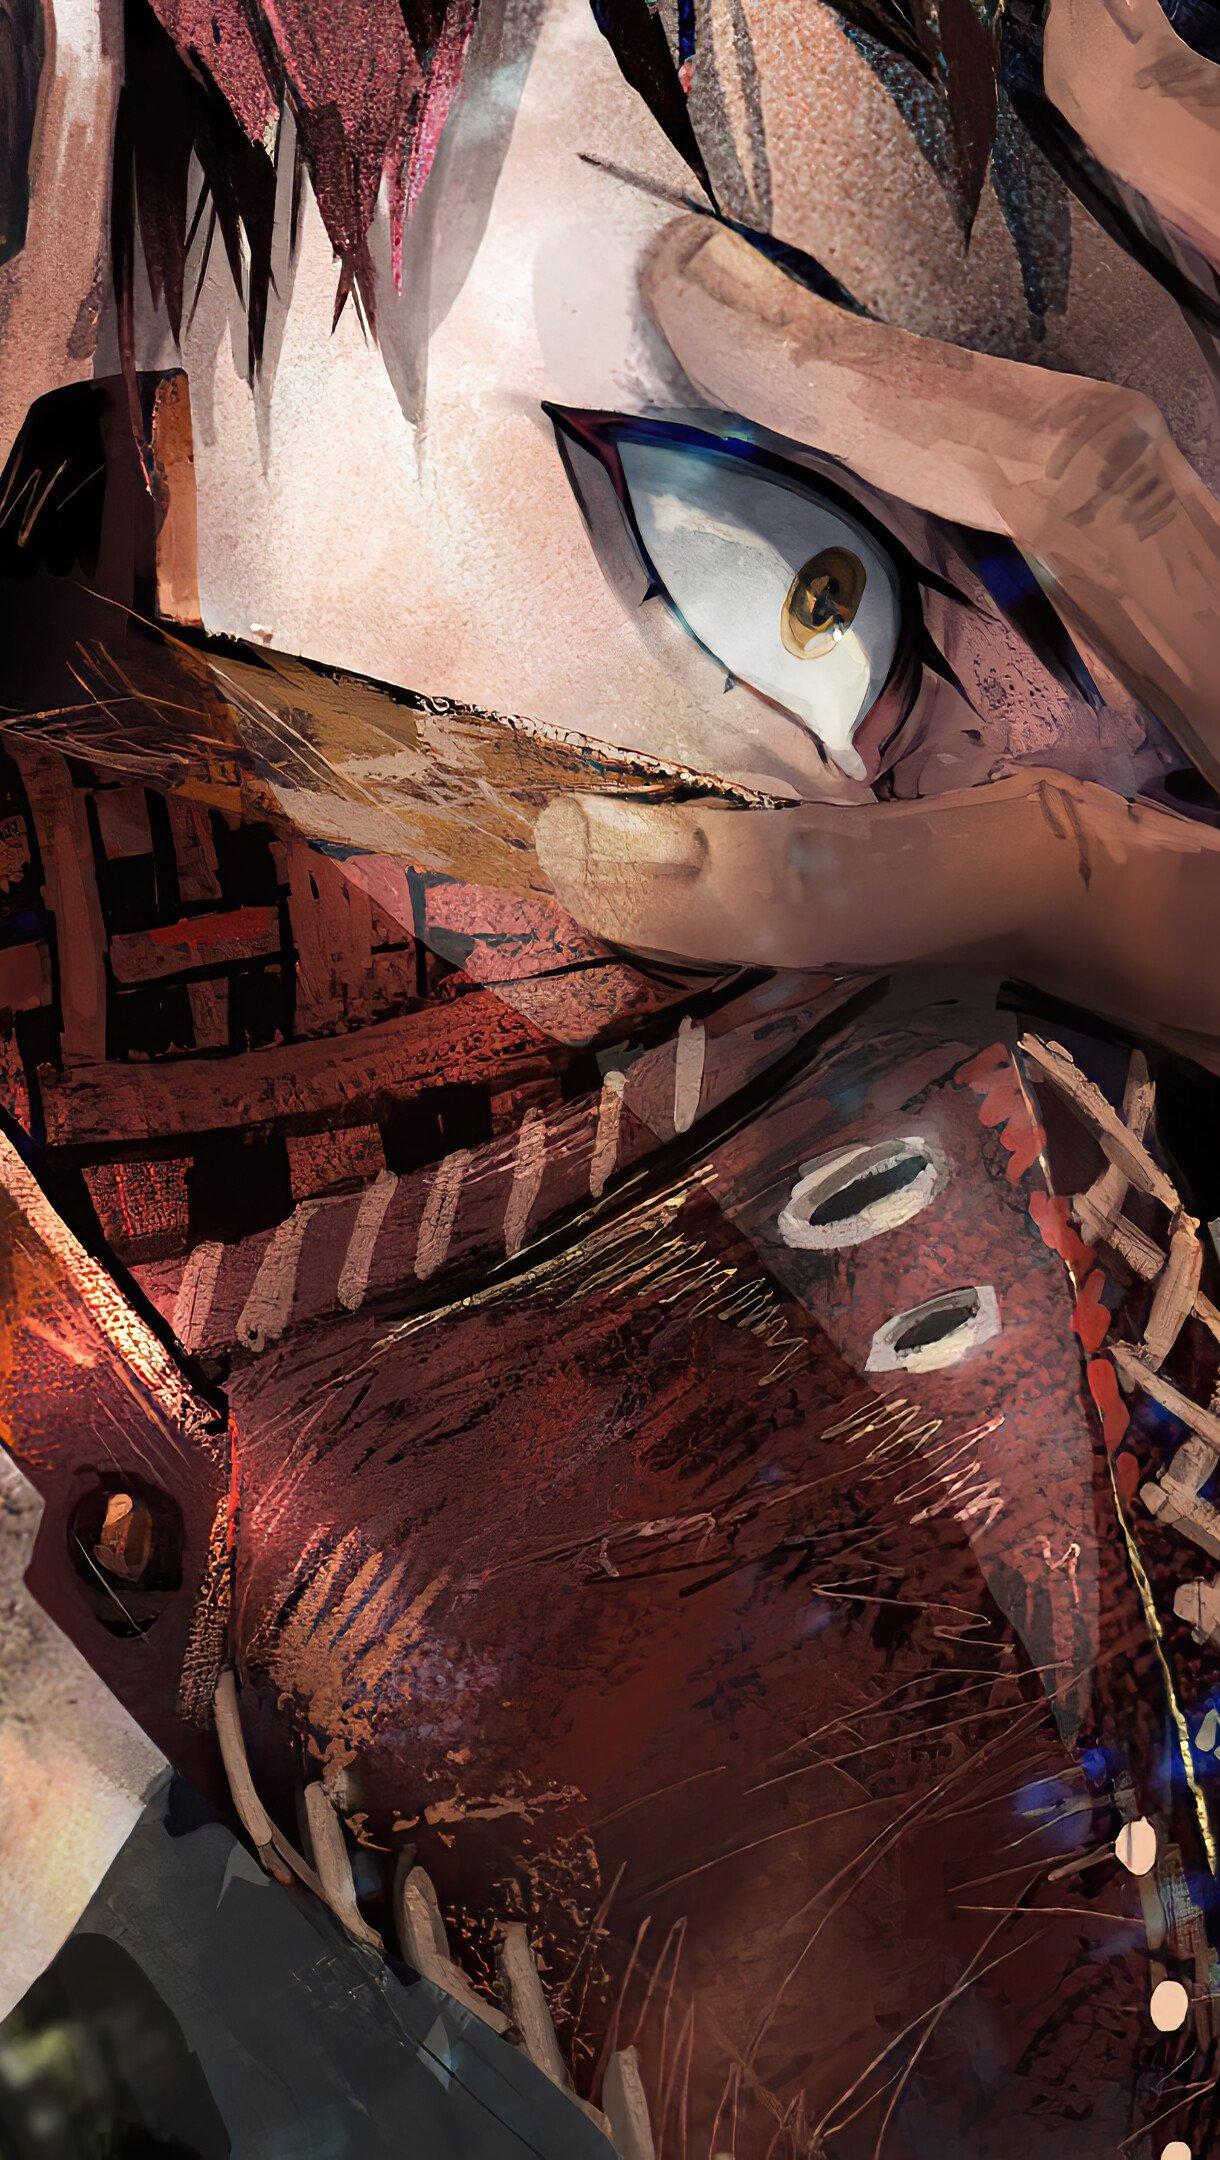 Anime Wallpaper Kai Chisaki character from My hero Academy Vertical